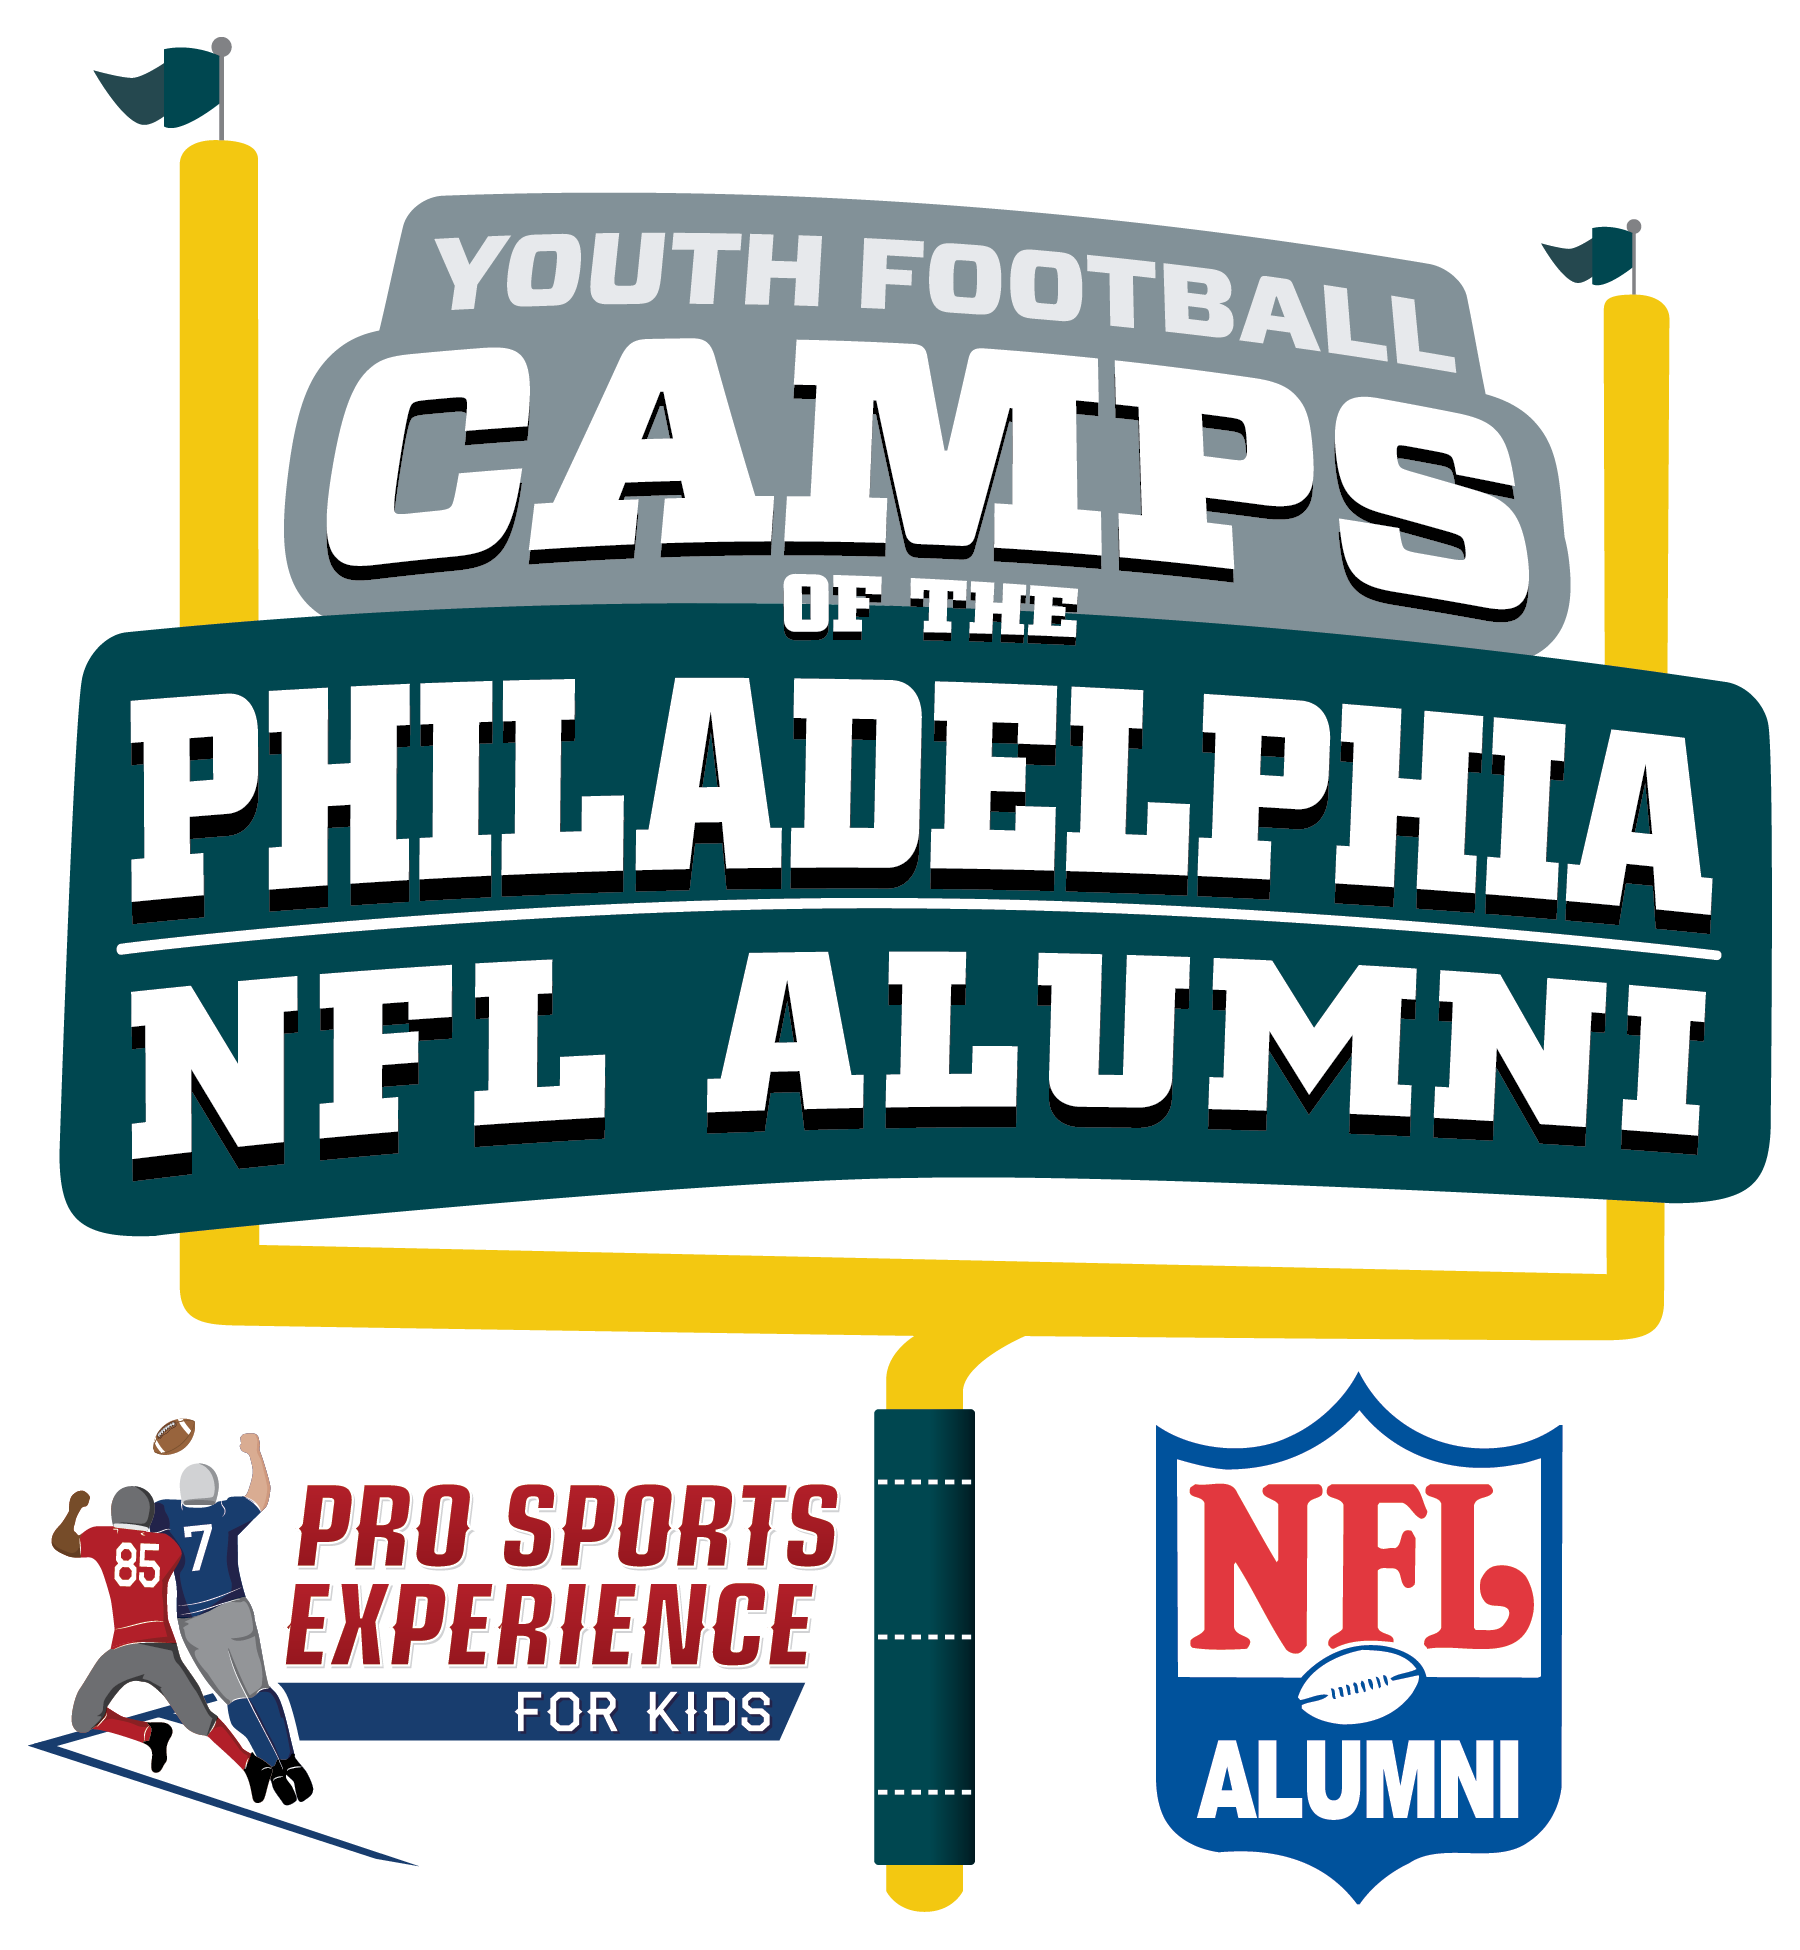 Philadelphia NFL Alumni Hero Youth Football Camps - Cherry Hill